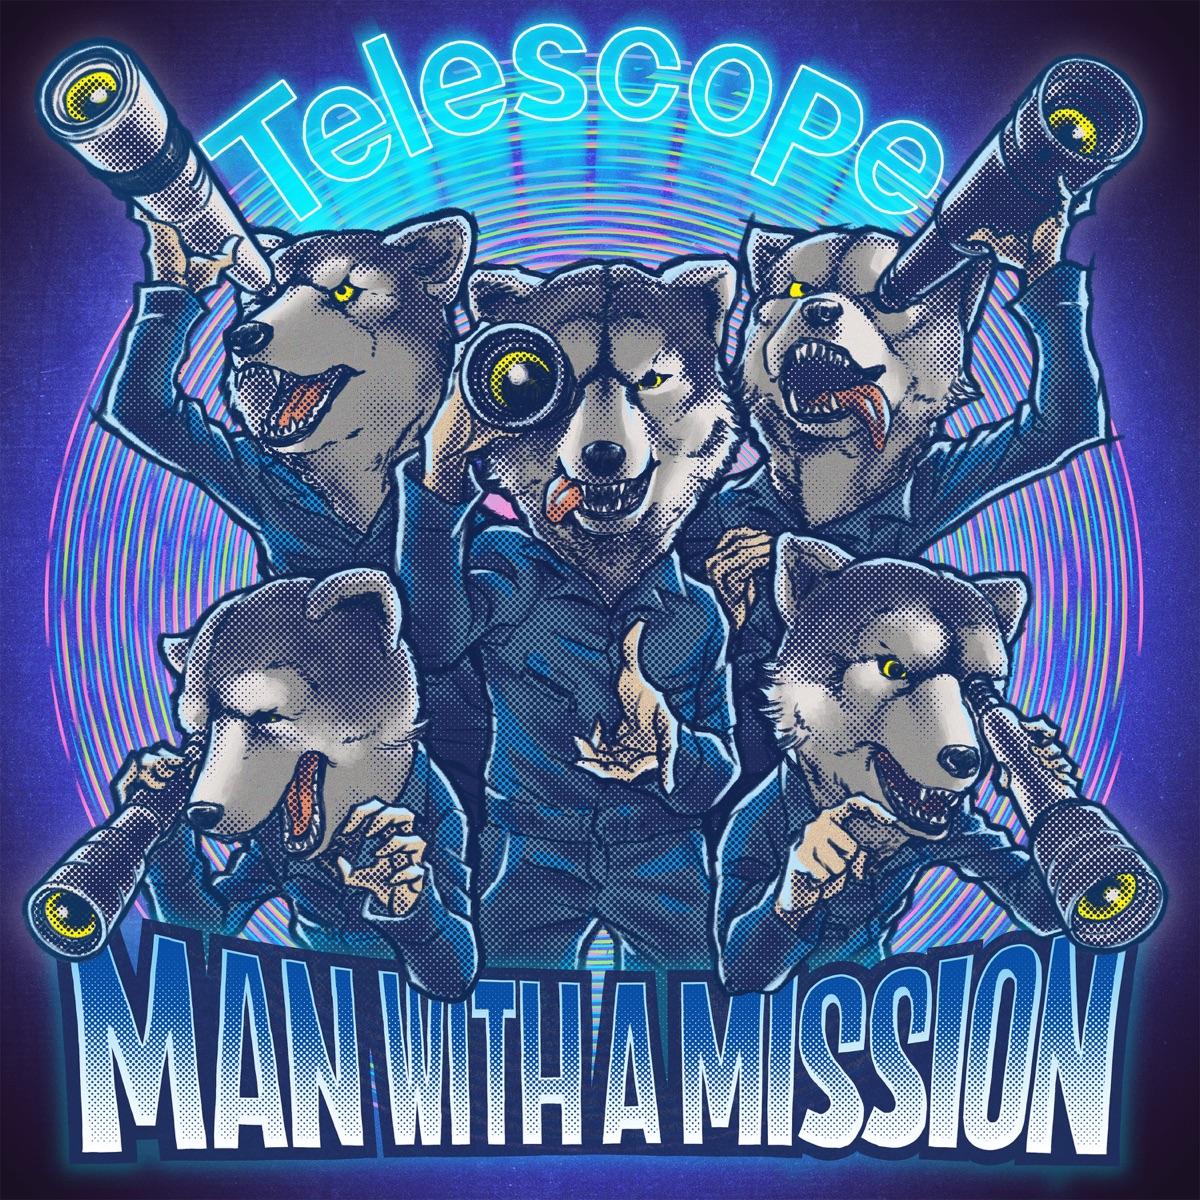 『MAN WITH A MISSION - Telescope 歌詞』収録の『Telescope』ジャケット